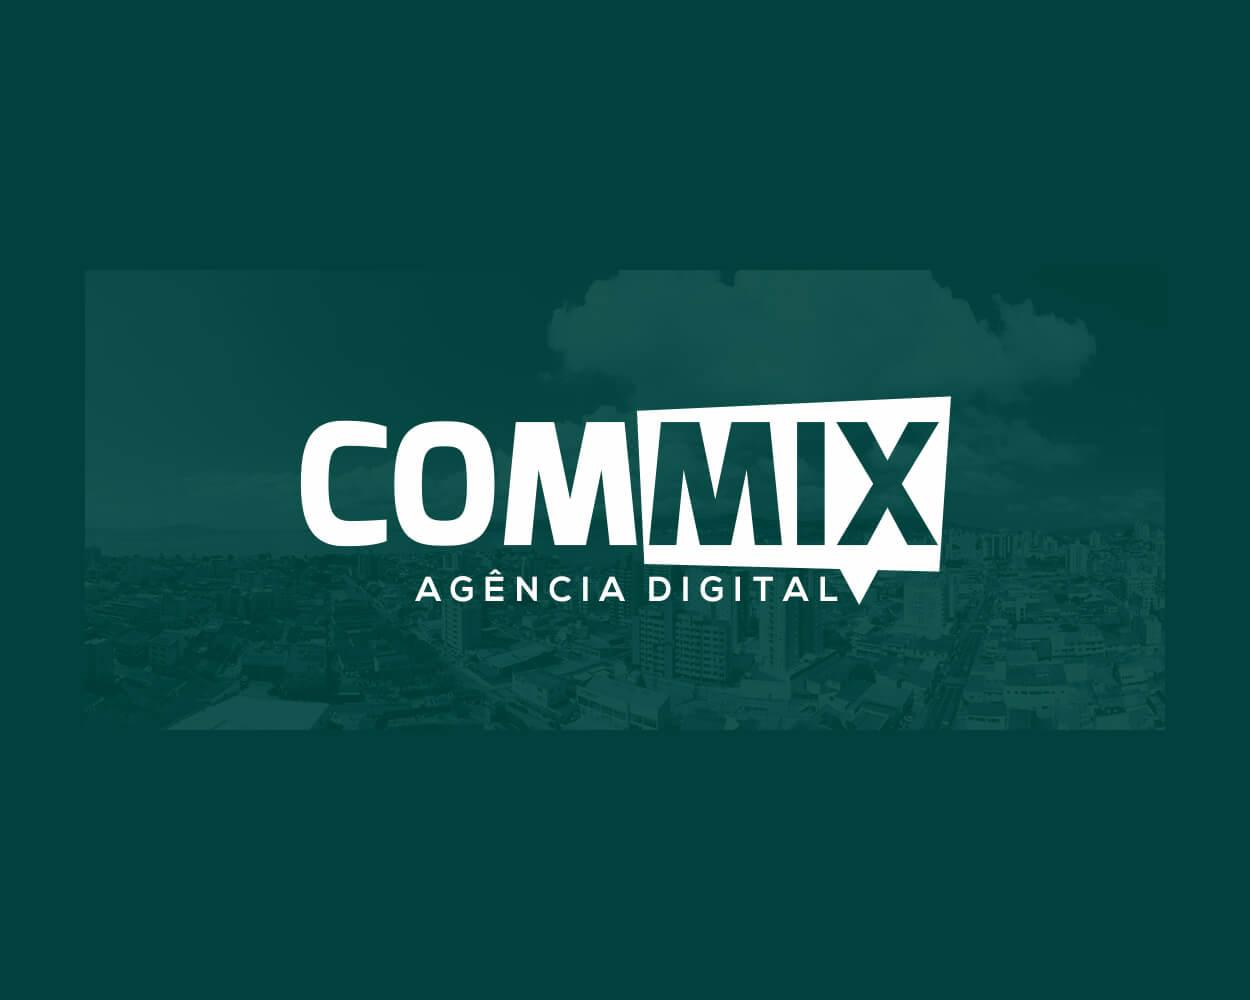 (c) Commix.com.br